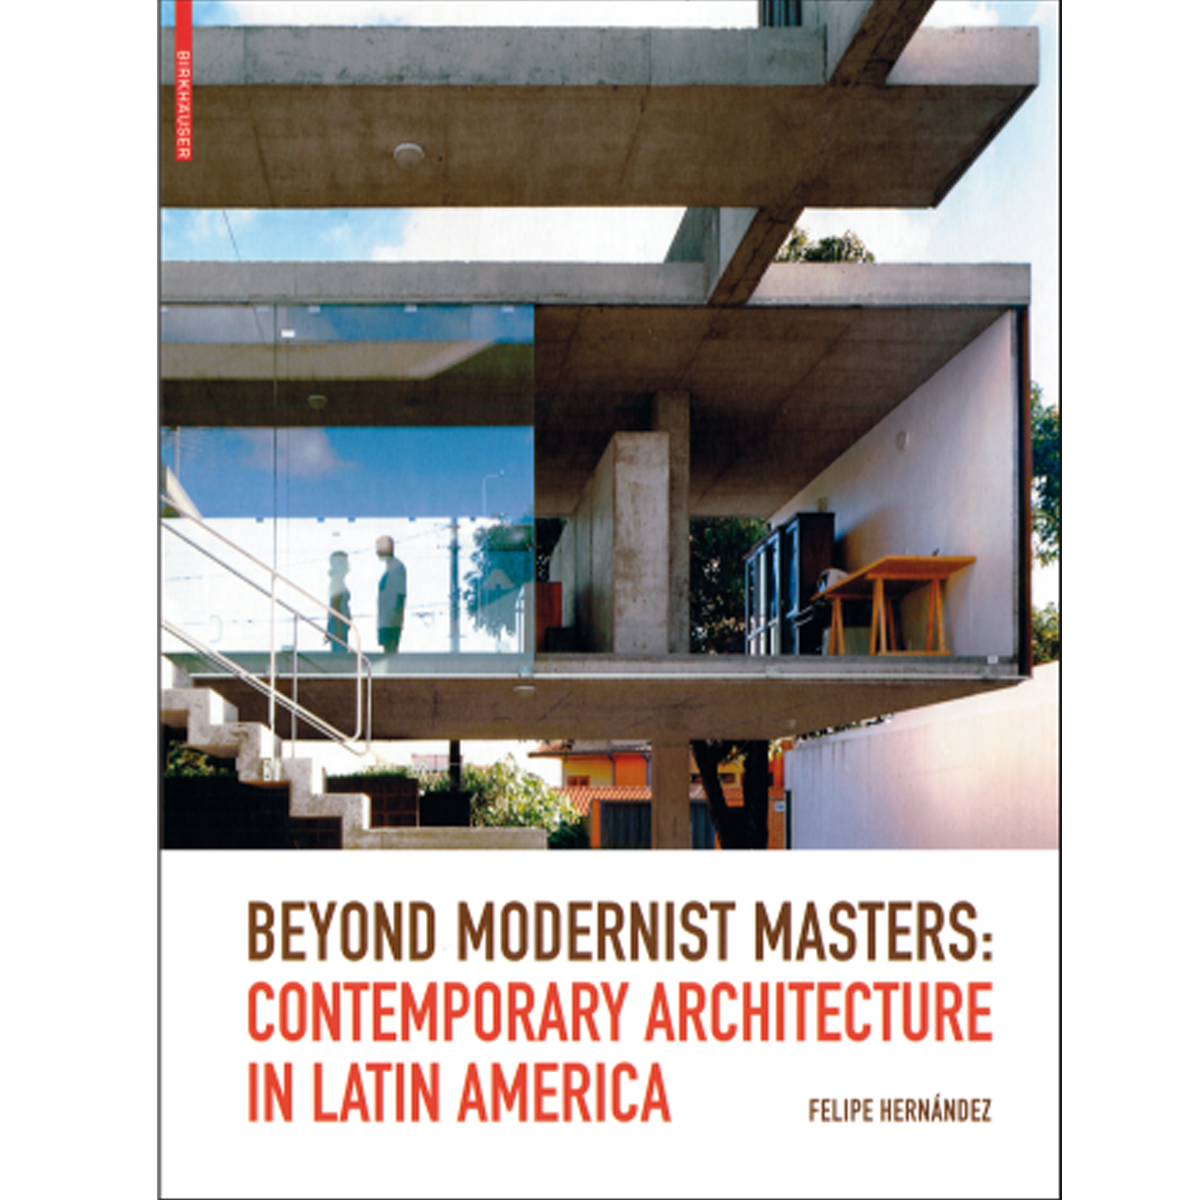 Beyond Modernist Masters